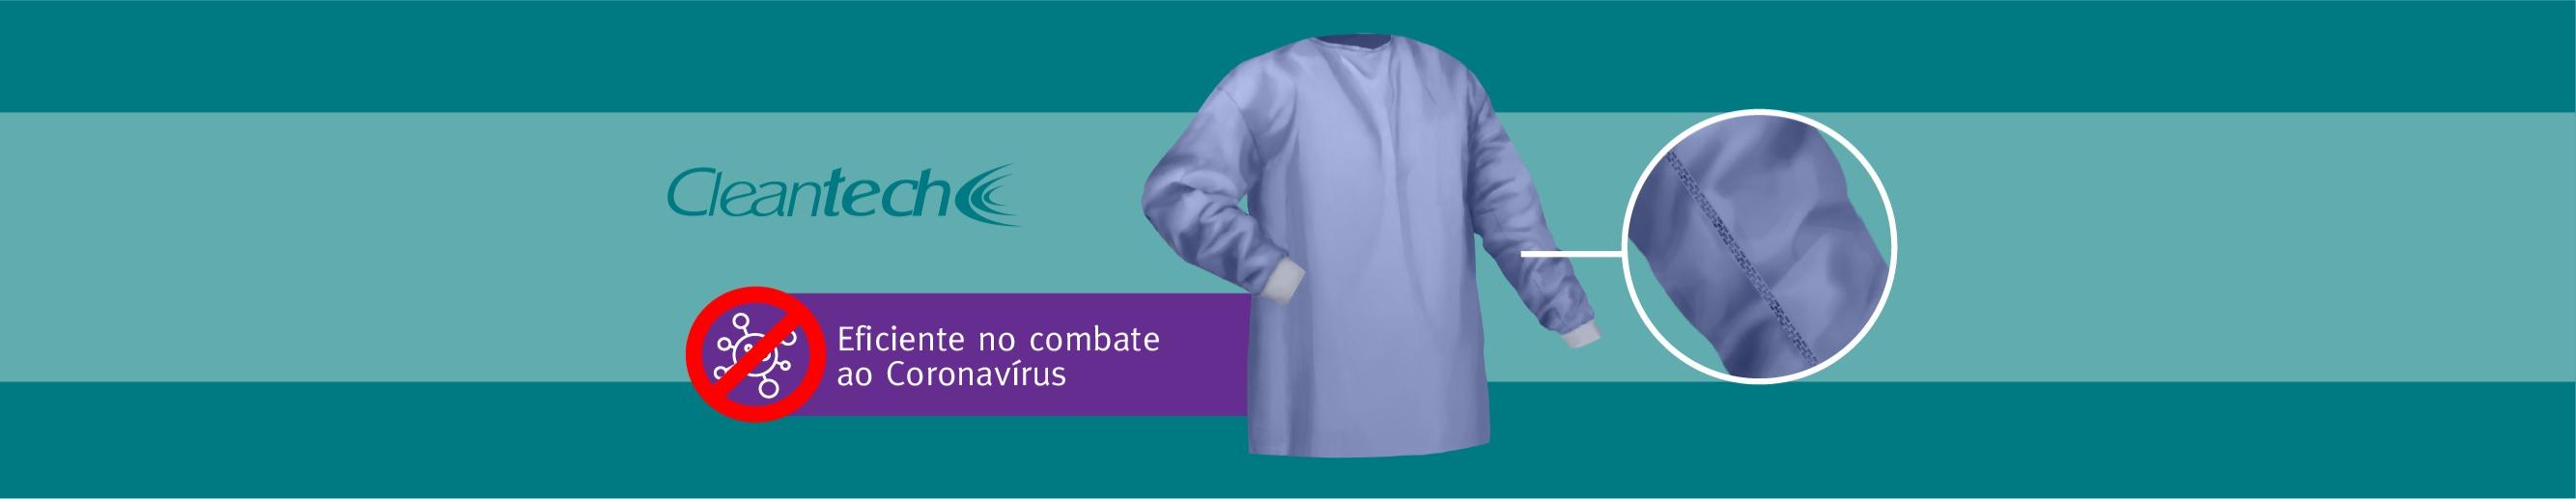 Medclean_Coronavirus_banner%20site-01_ed